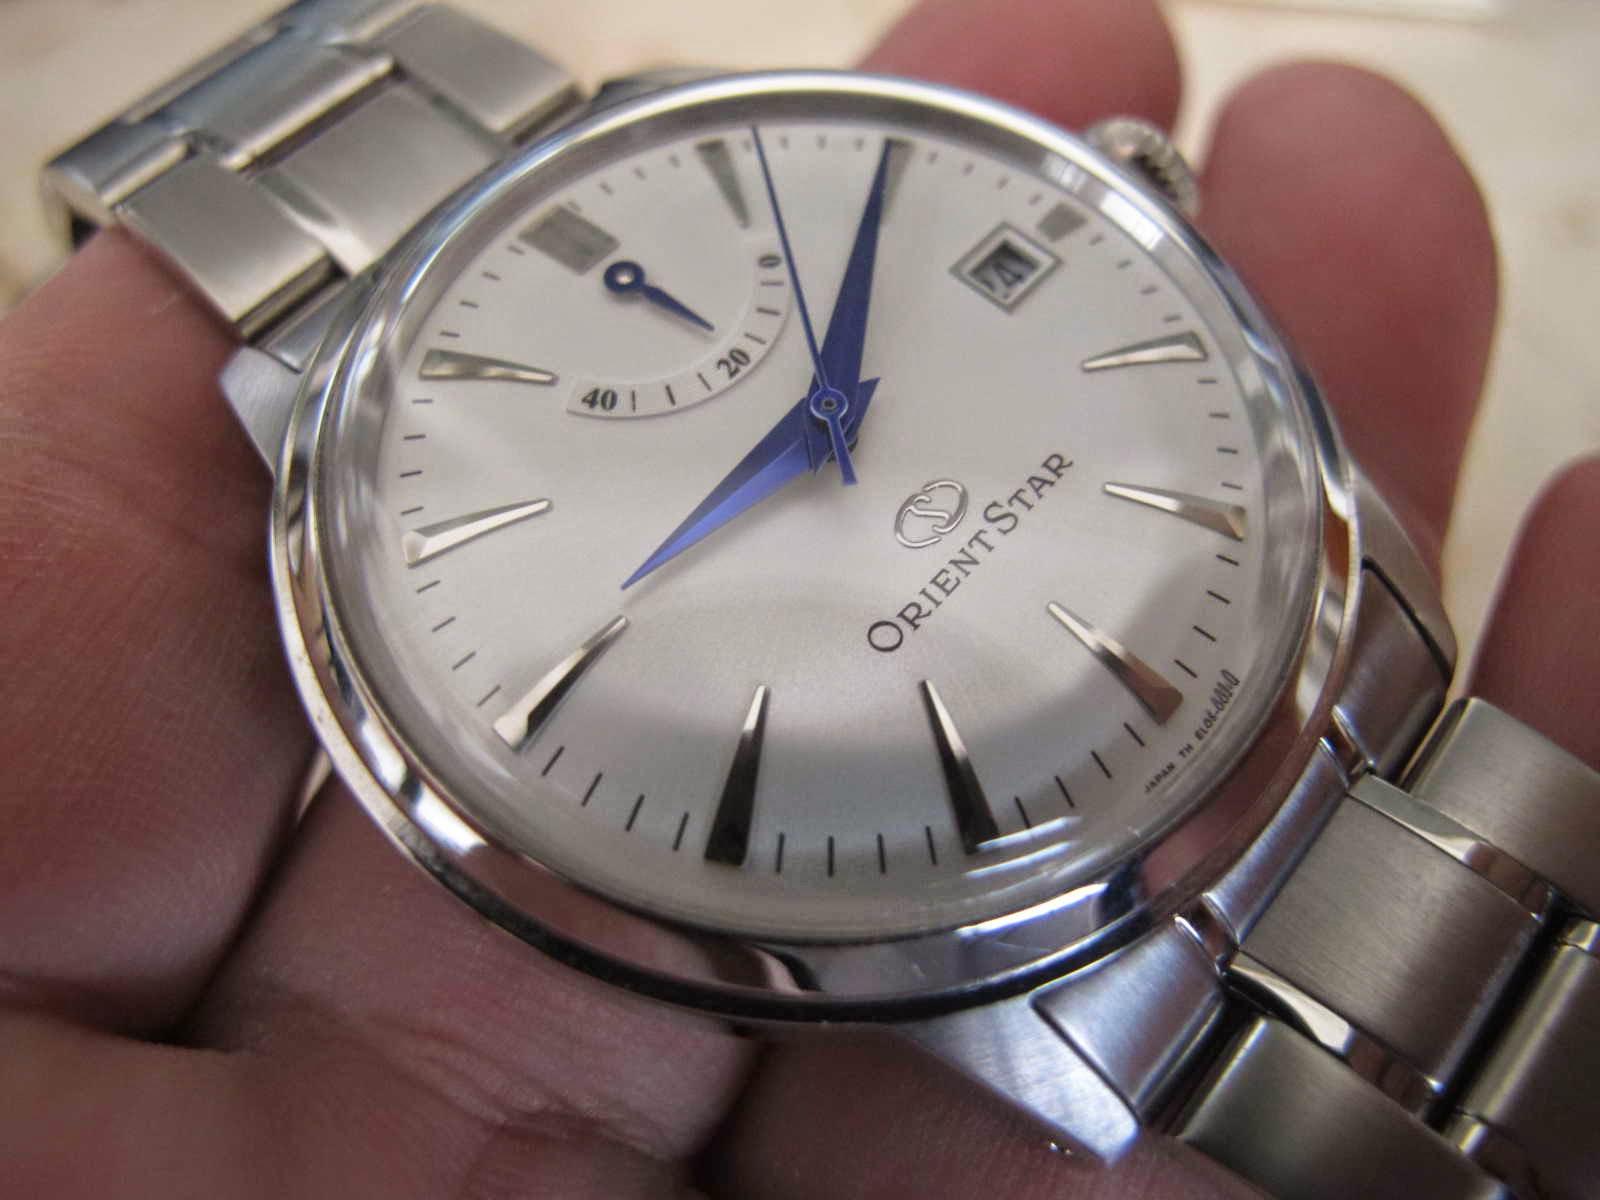 Kondisi ORIENT STAR ini Brand New Watch lengkap dengan box dan warranty card Cocok untuk Anda yang sedang mencari jam tangan yang terdapat indicator